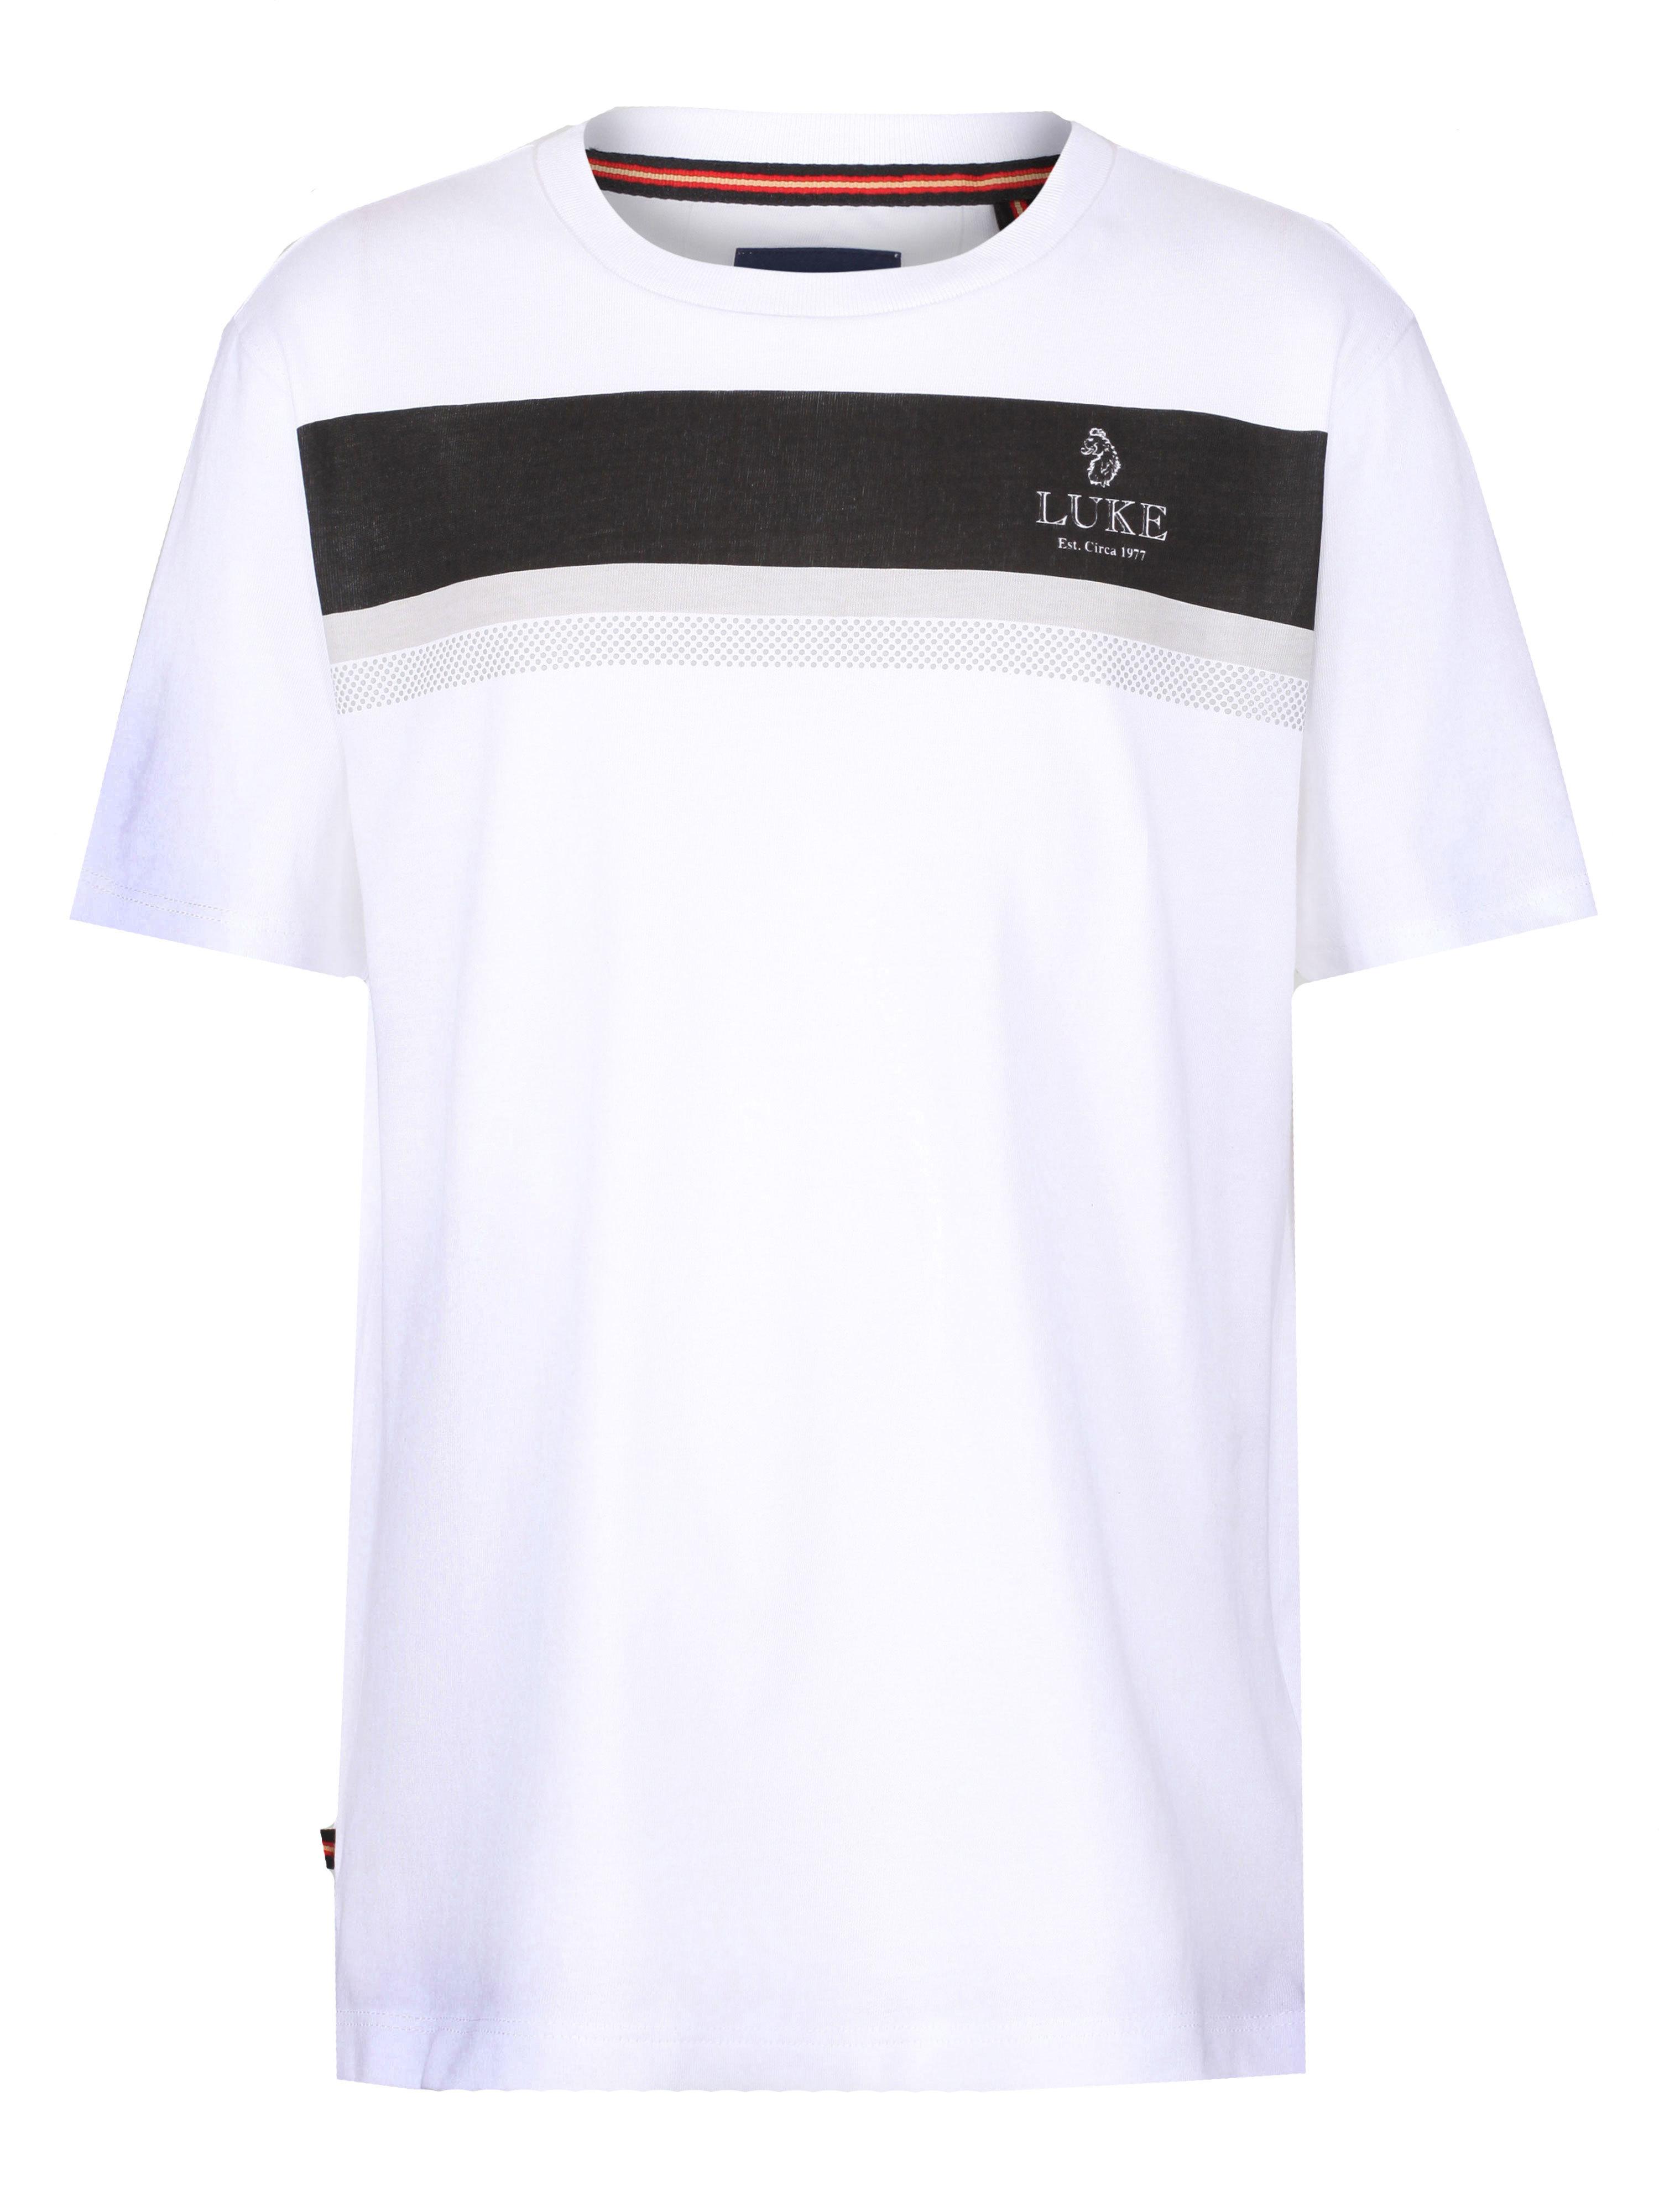 LUKE 1977 Stretchade Printed T-Shirt